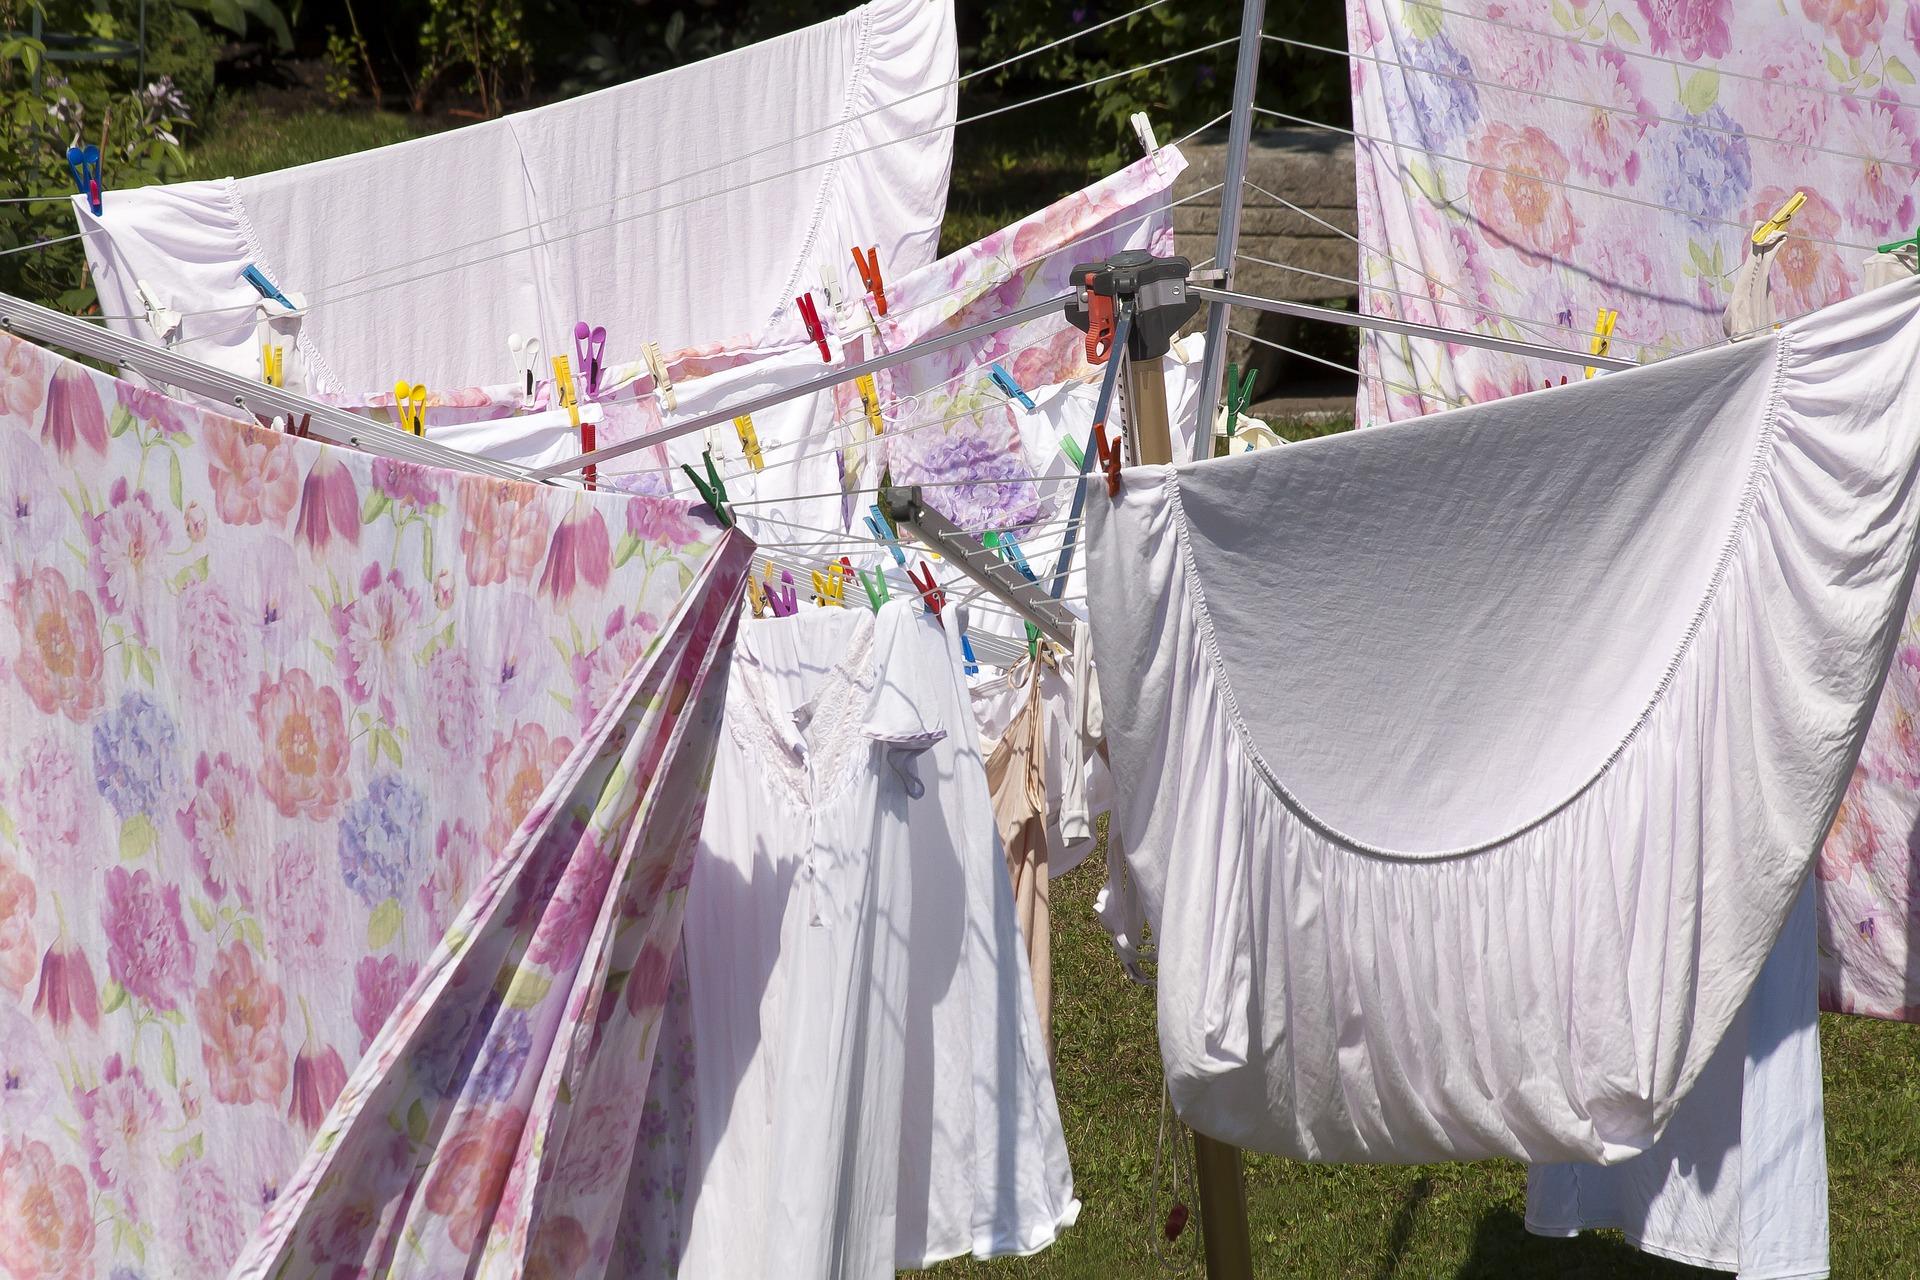 laundry-3559528_1920.jpg